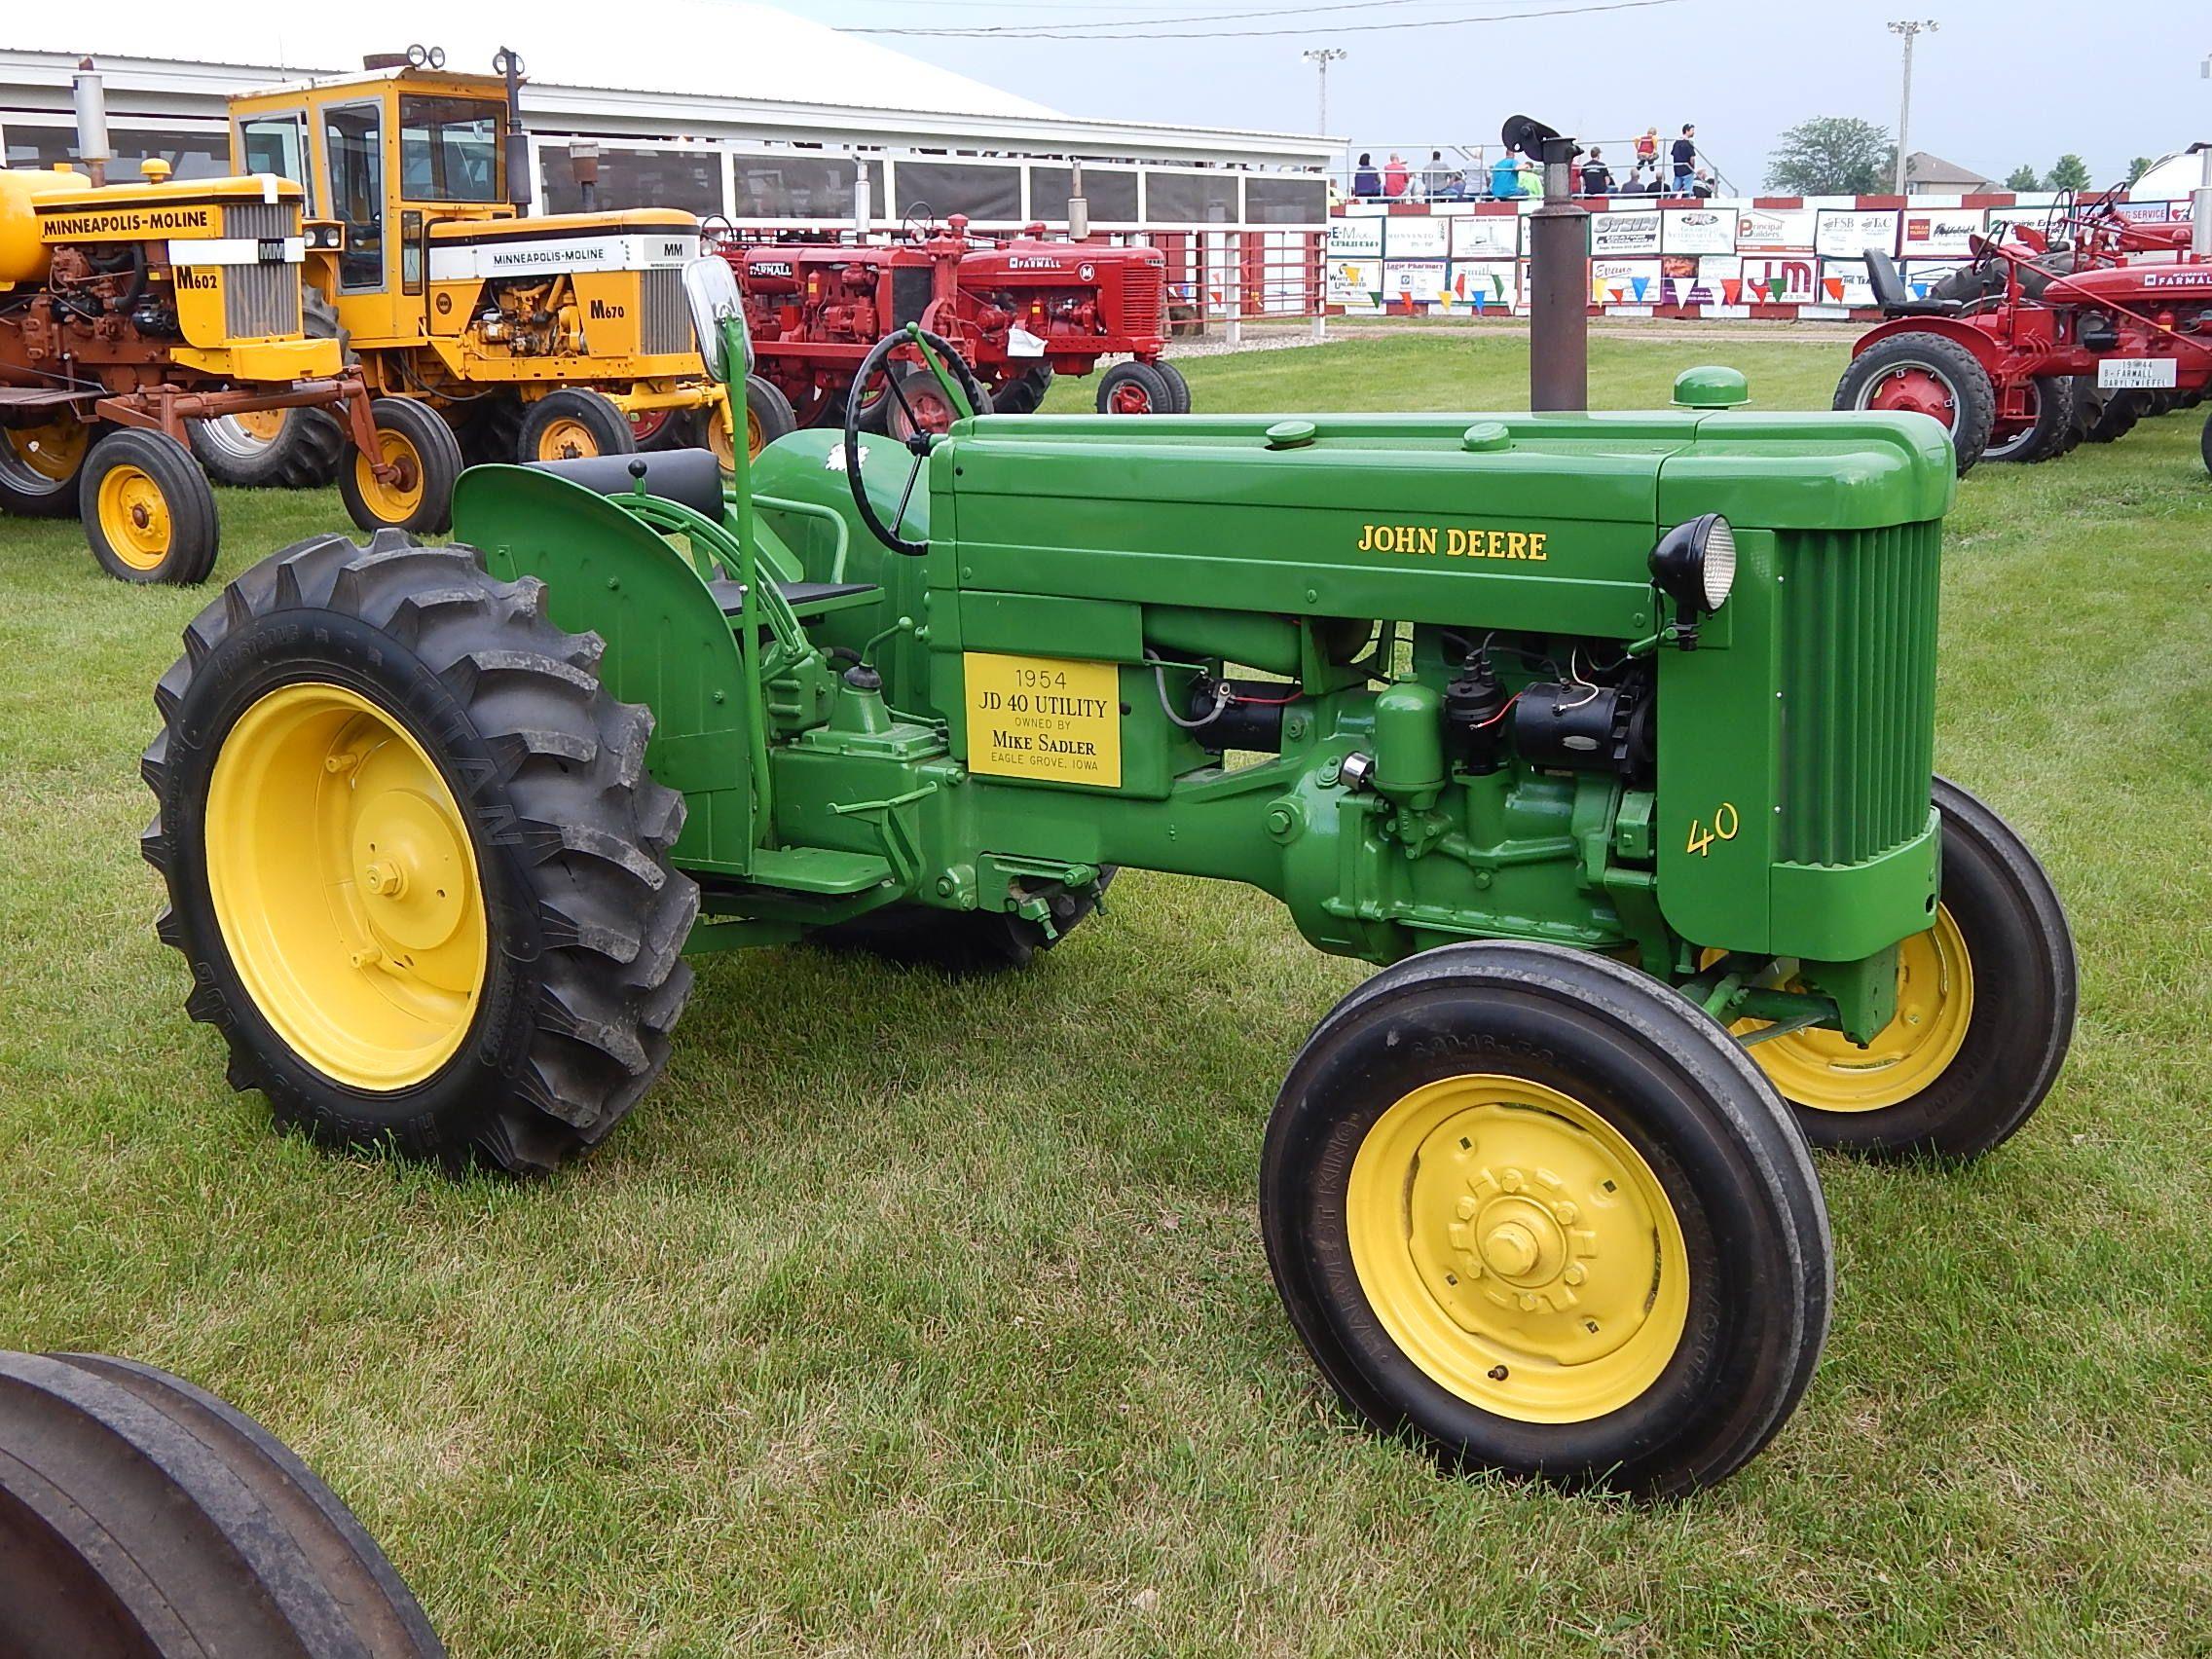 John deere jd utility tractors and farm